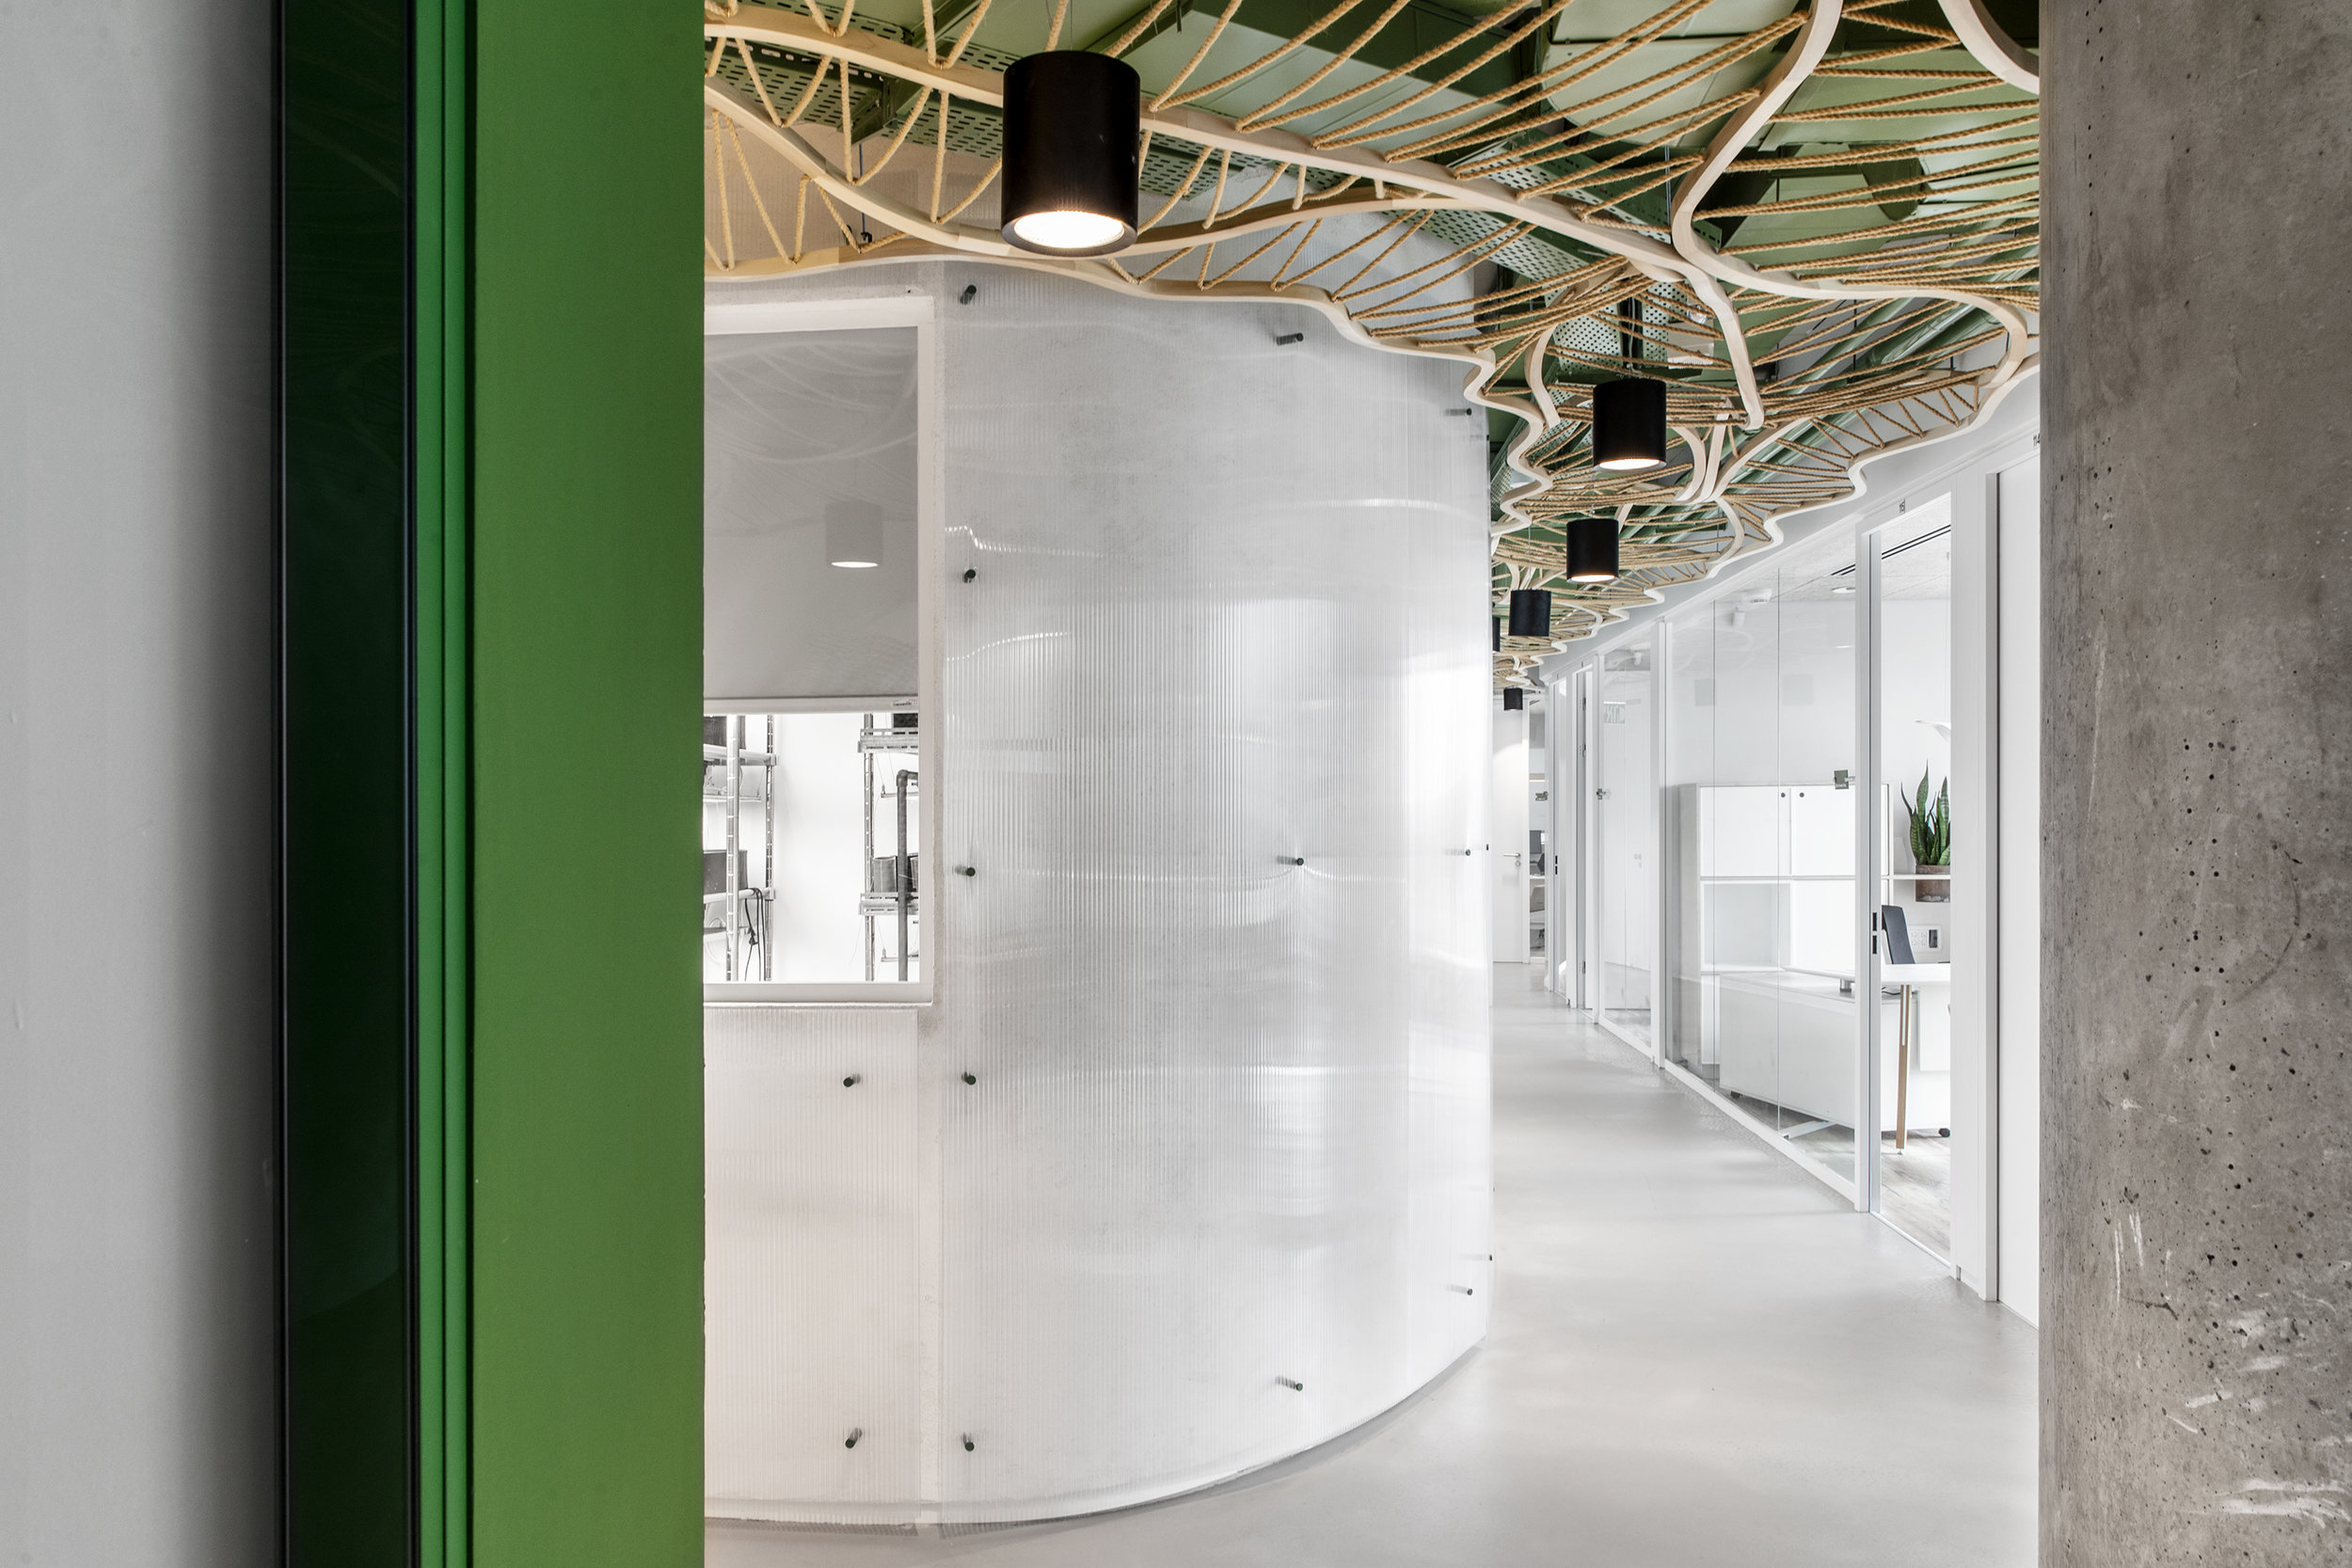 HINNOMAN - ROY DAVID ARCHTECTURE - STUDIO - סטודיו רואי דוד - אדריכלים (27).jpg